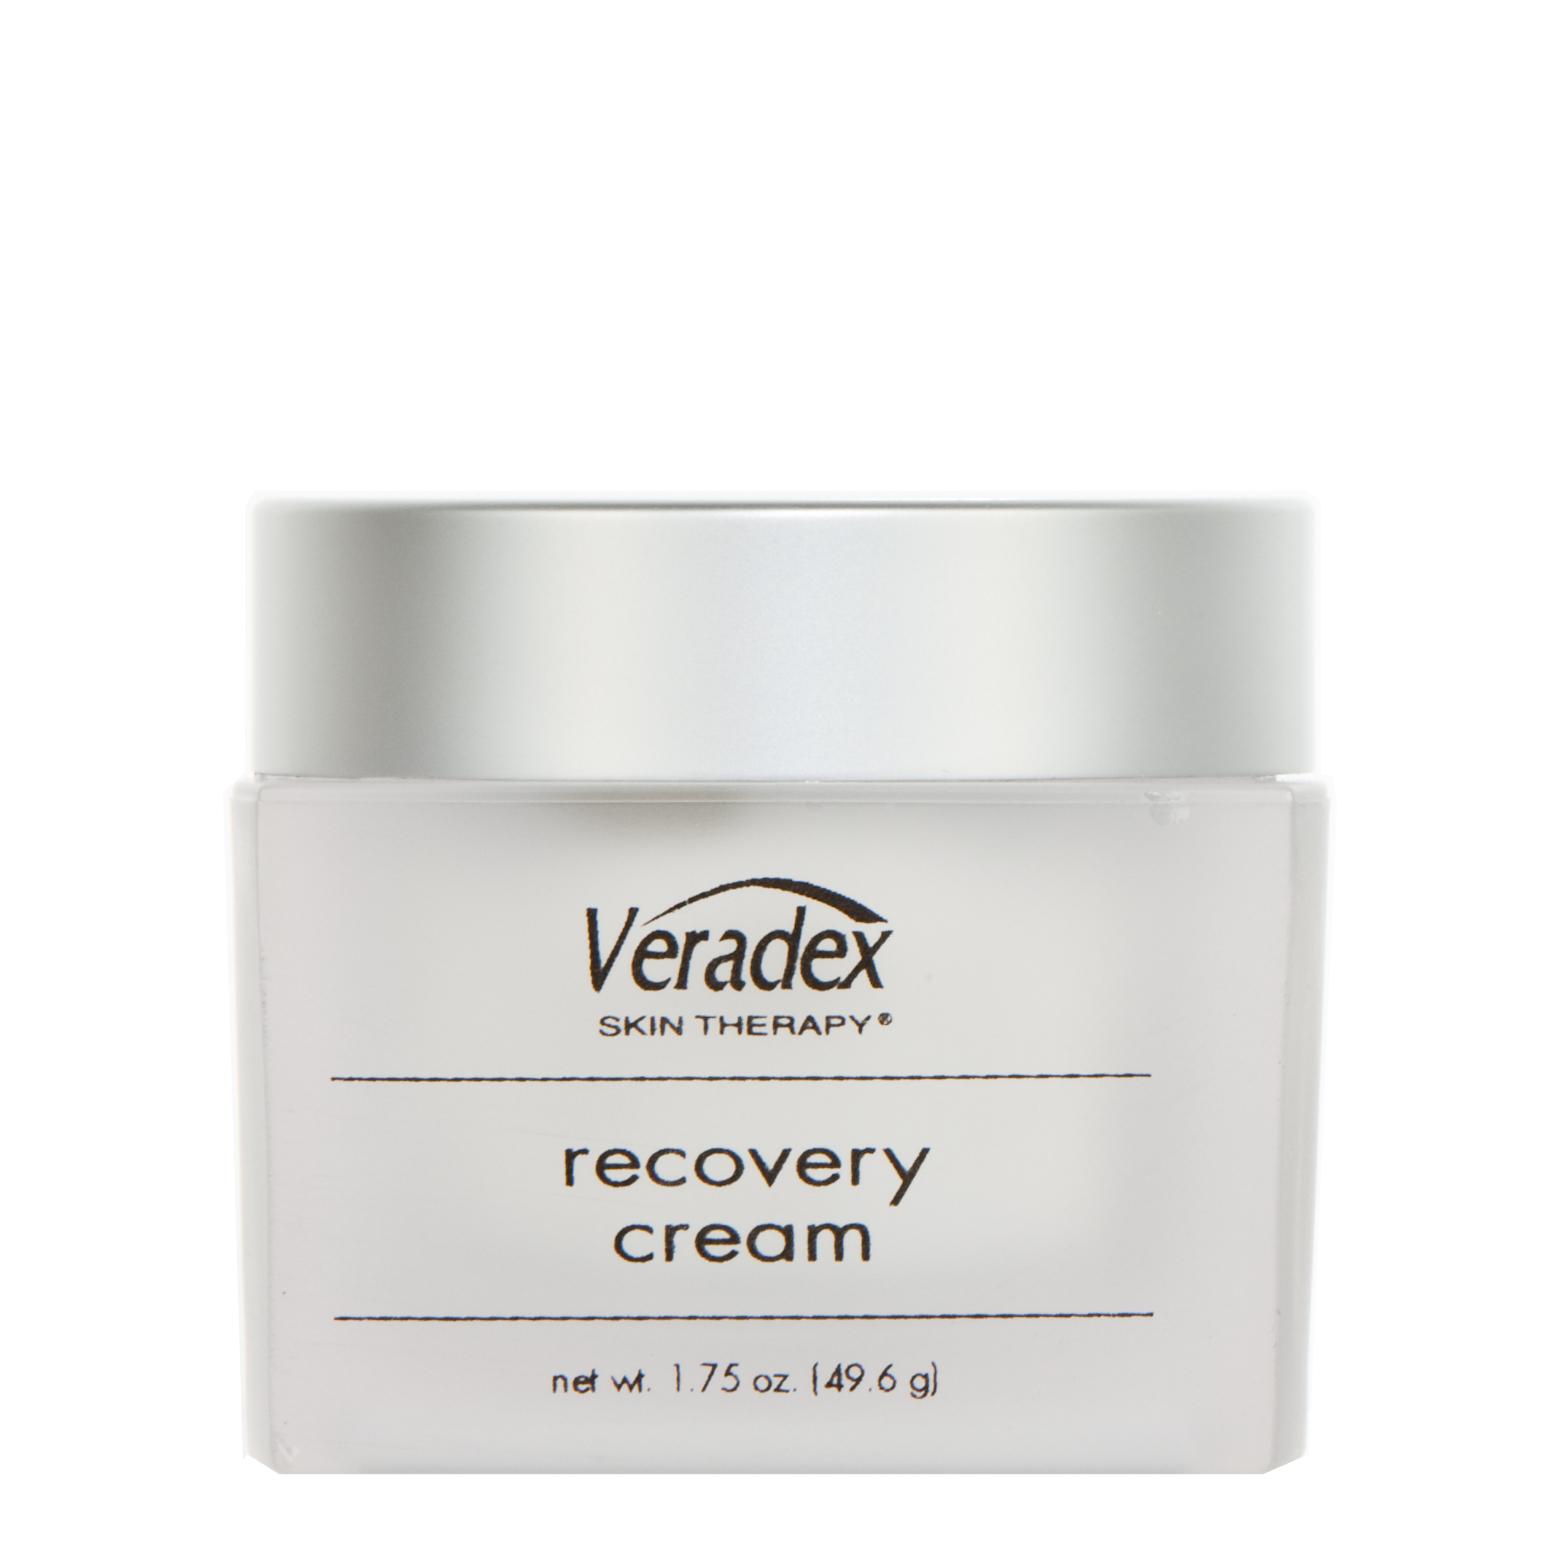 veradexrecoverycream-1308063579